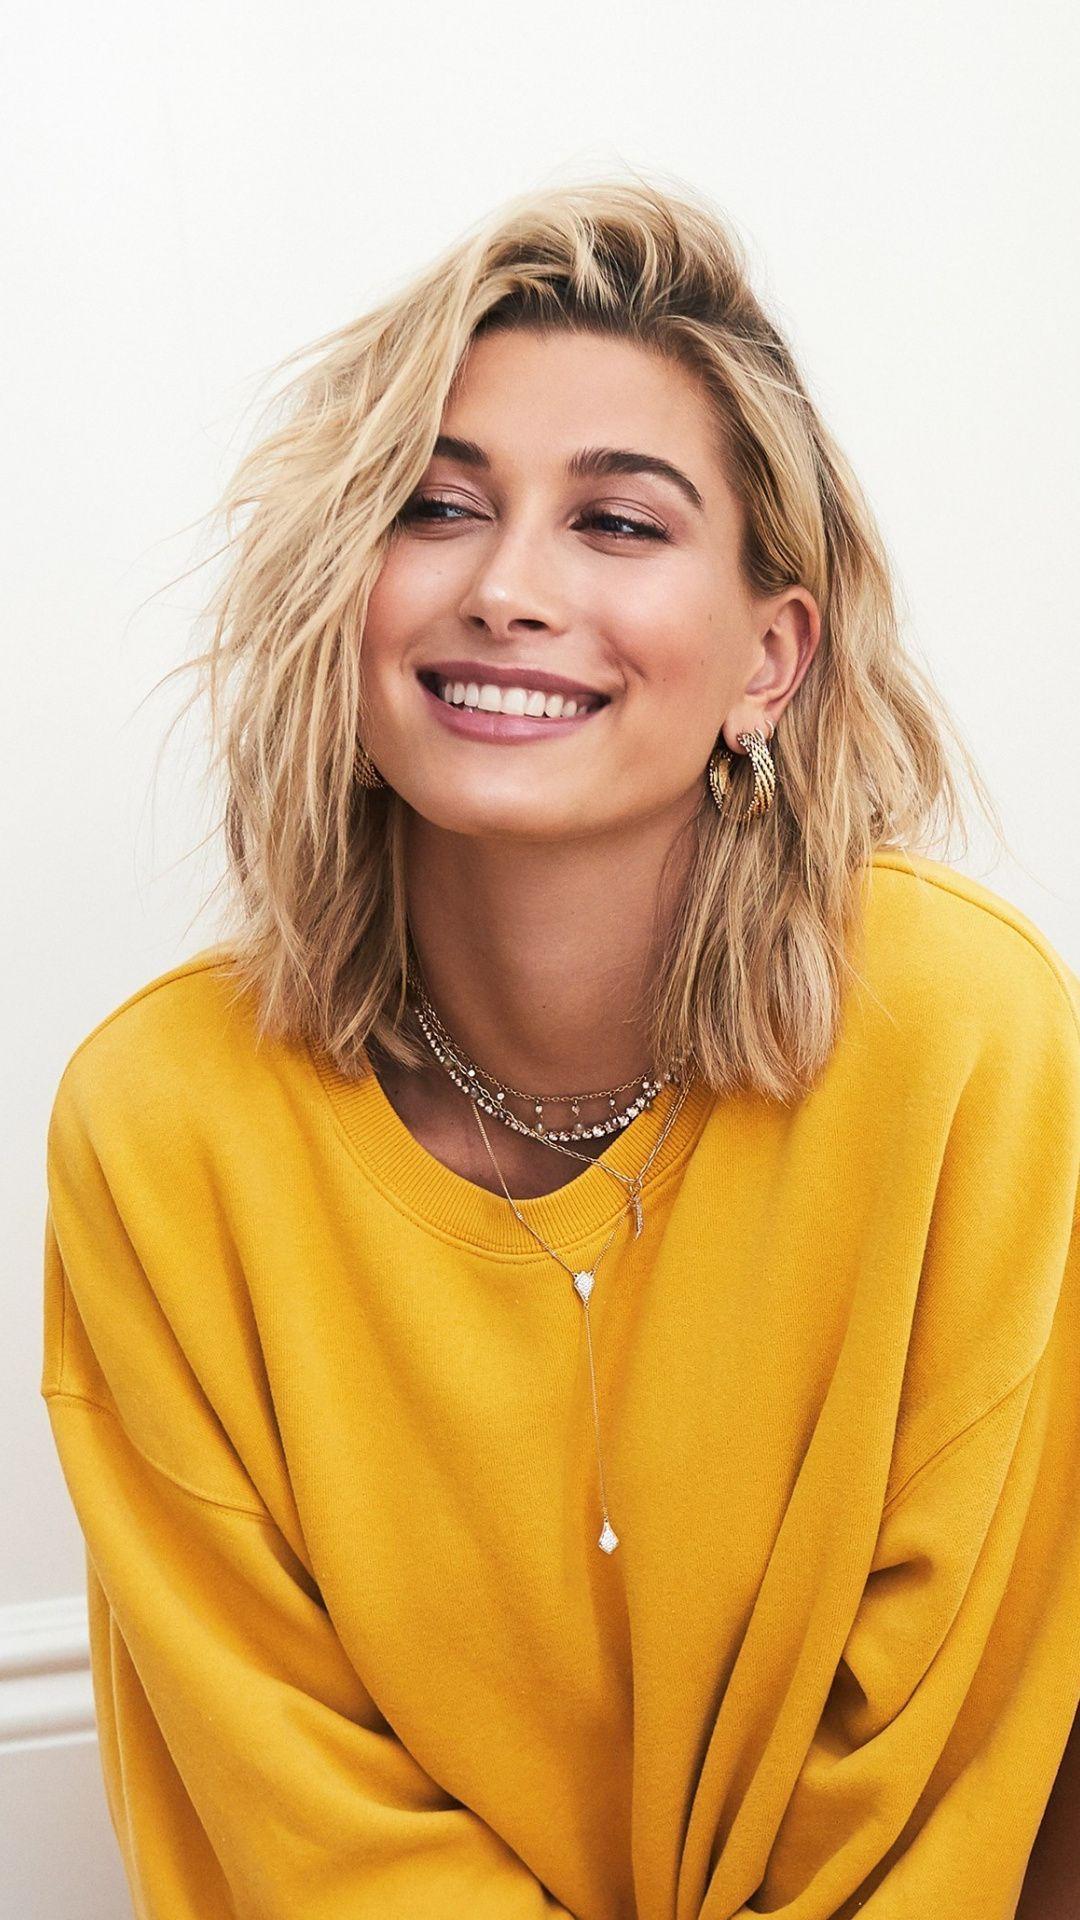 Photo of #baldwin #Hailey #background #Teen #vogue Hailey Baldwin, Teen Vogue, 2018 …